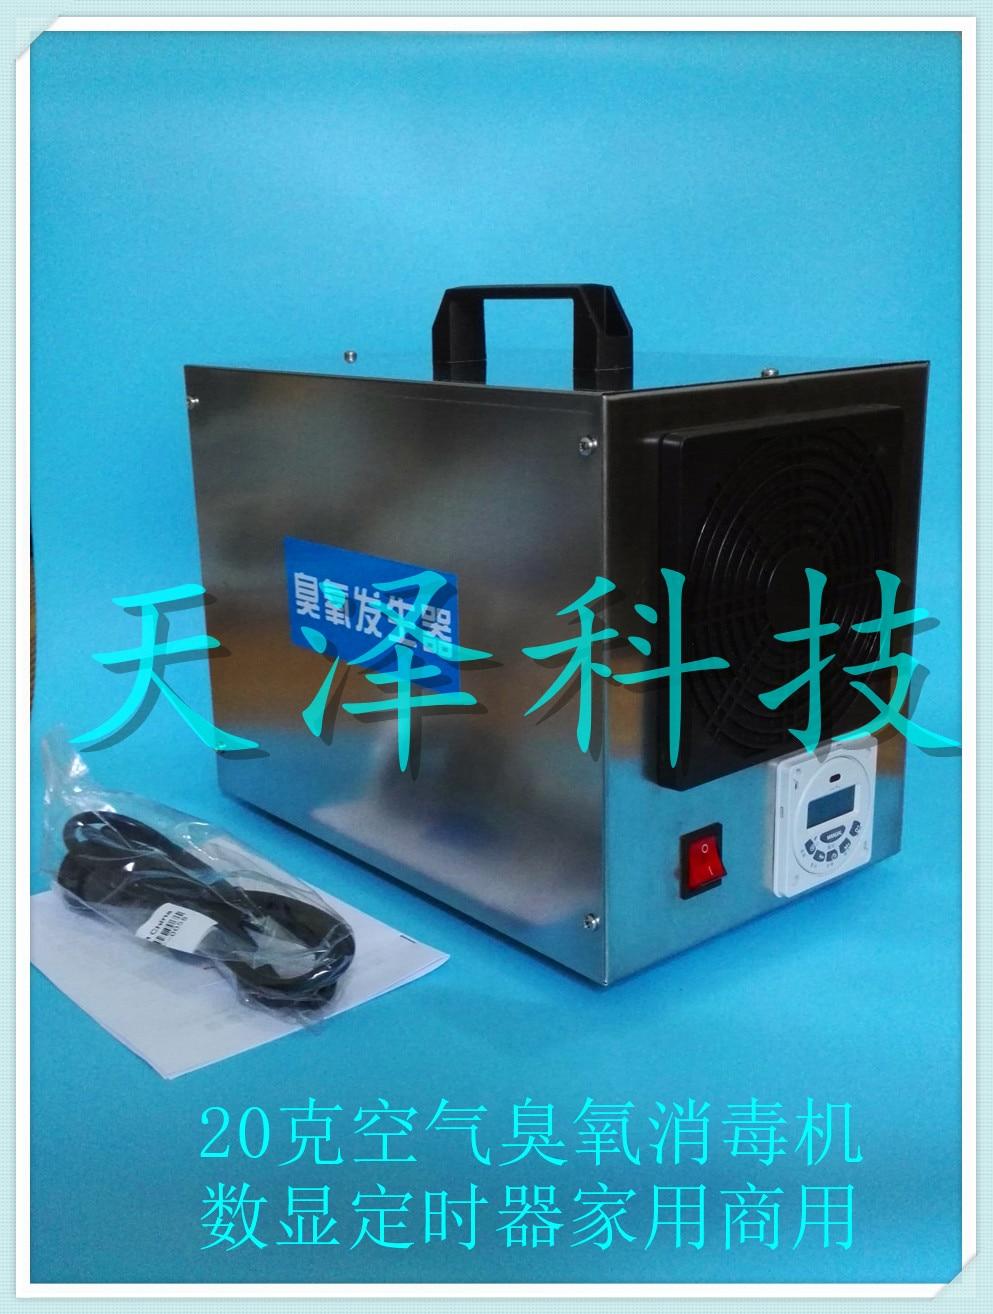 20g/h ozone generator air sterilization and odor removal formaldehyde digital display timing workshop ozone h 03